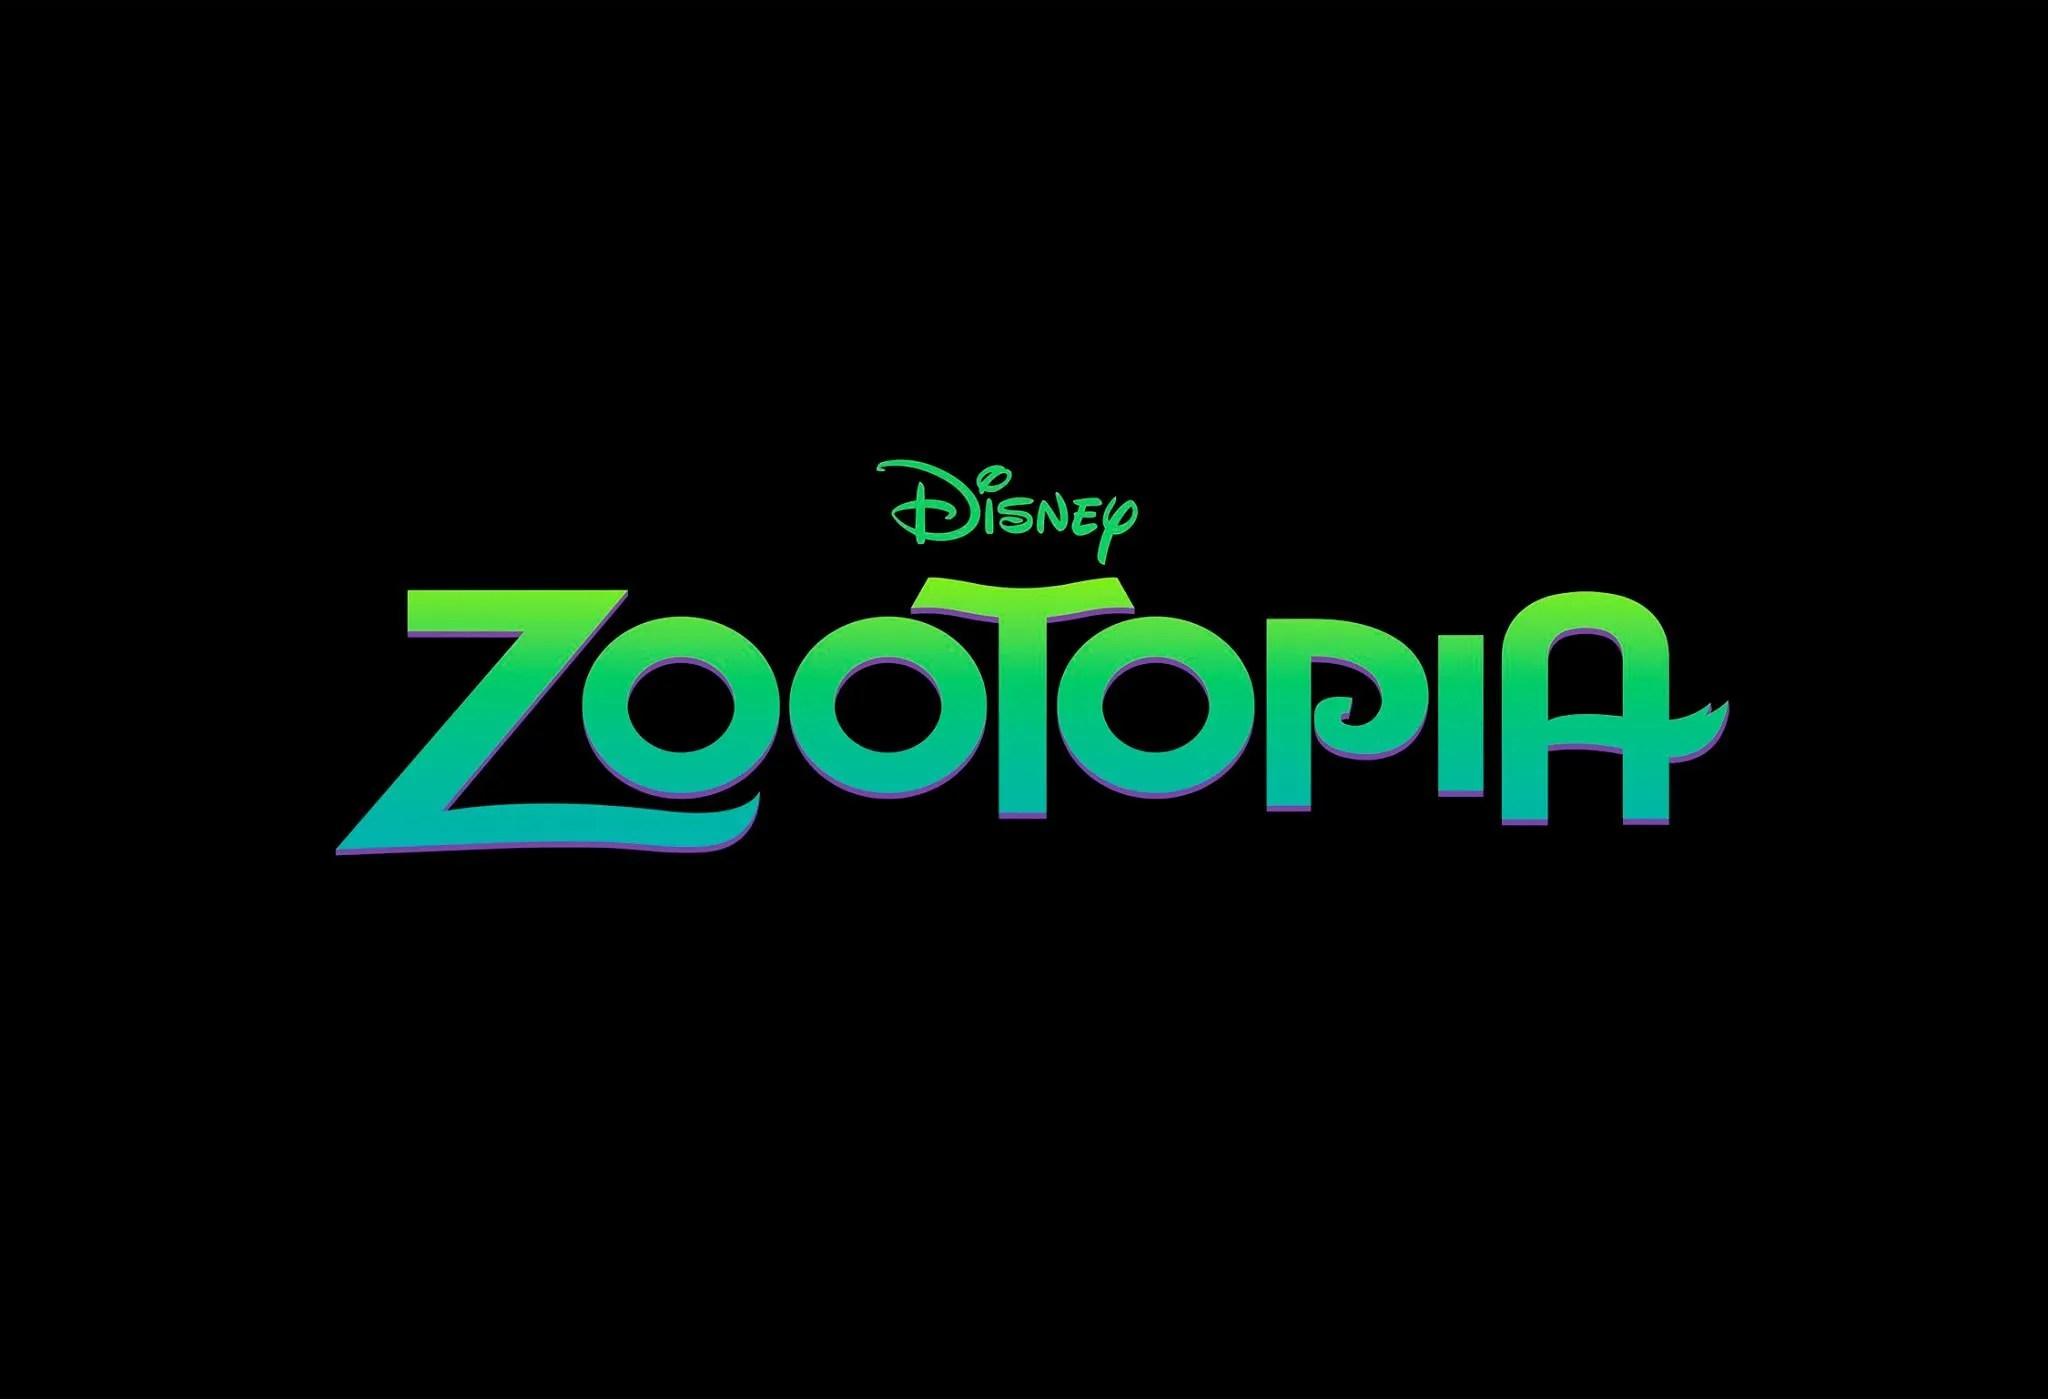 Disney Reveals Movie Logos for Major Upcoming Releases